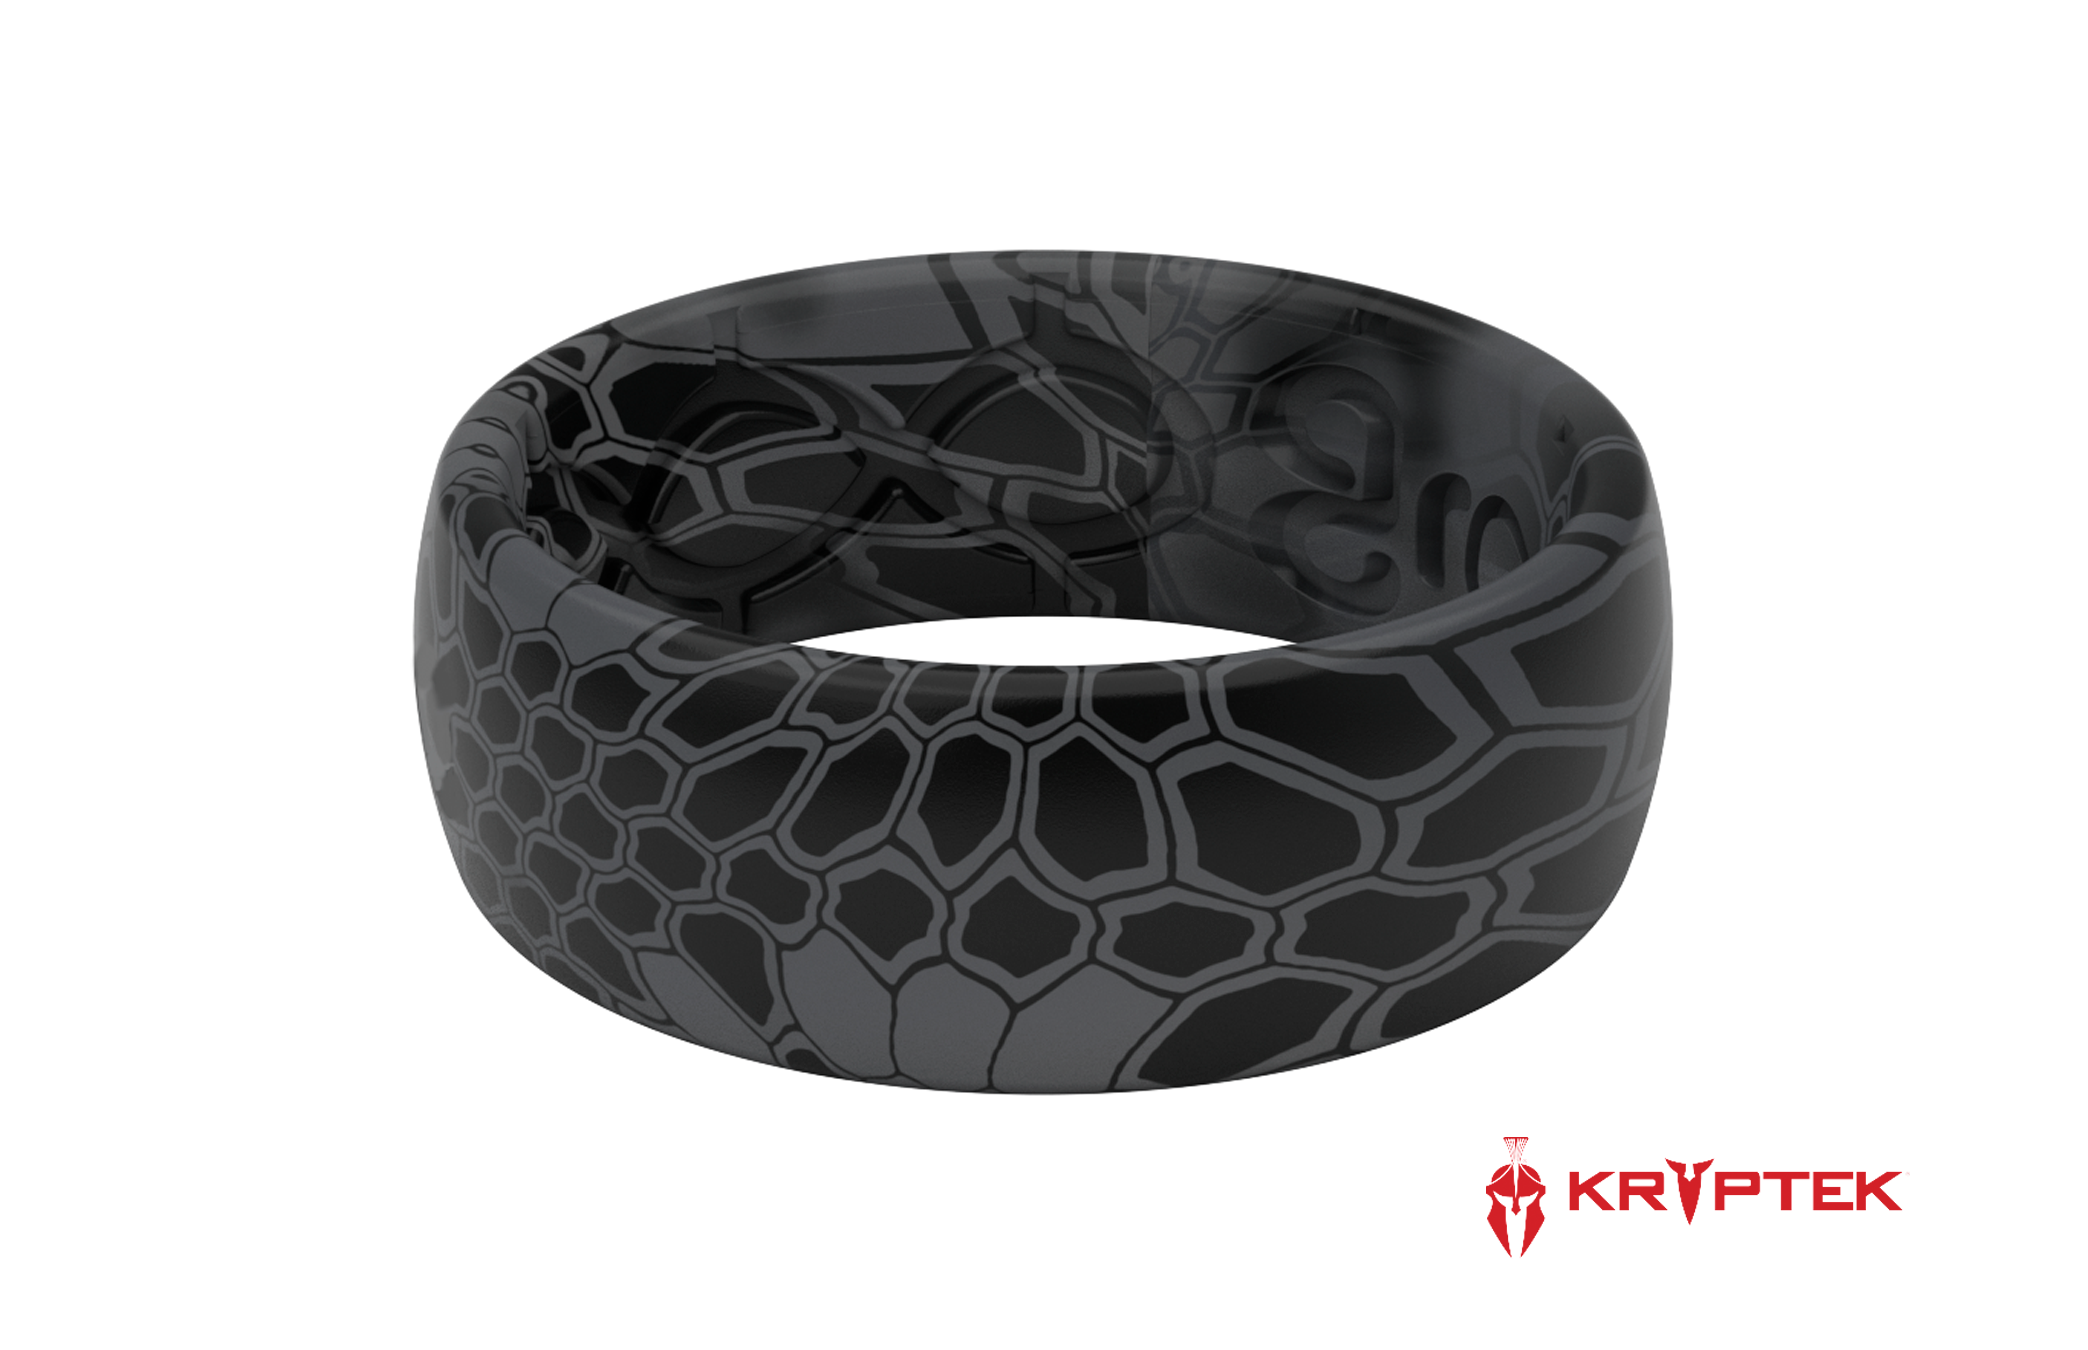 Original Camo Kryptek Typhon Silicone rings, Mens